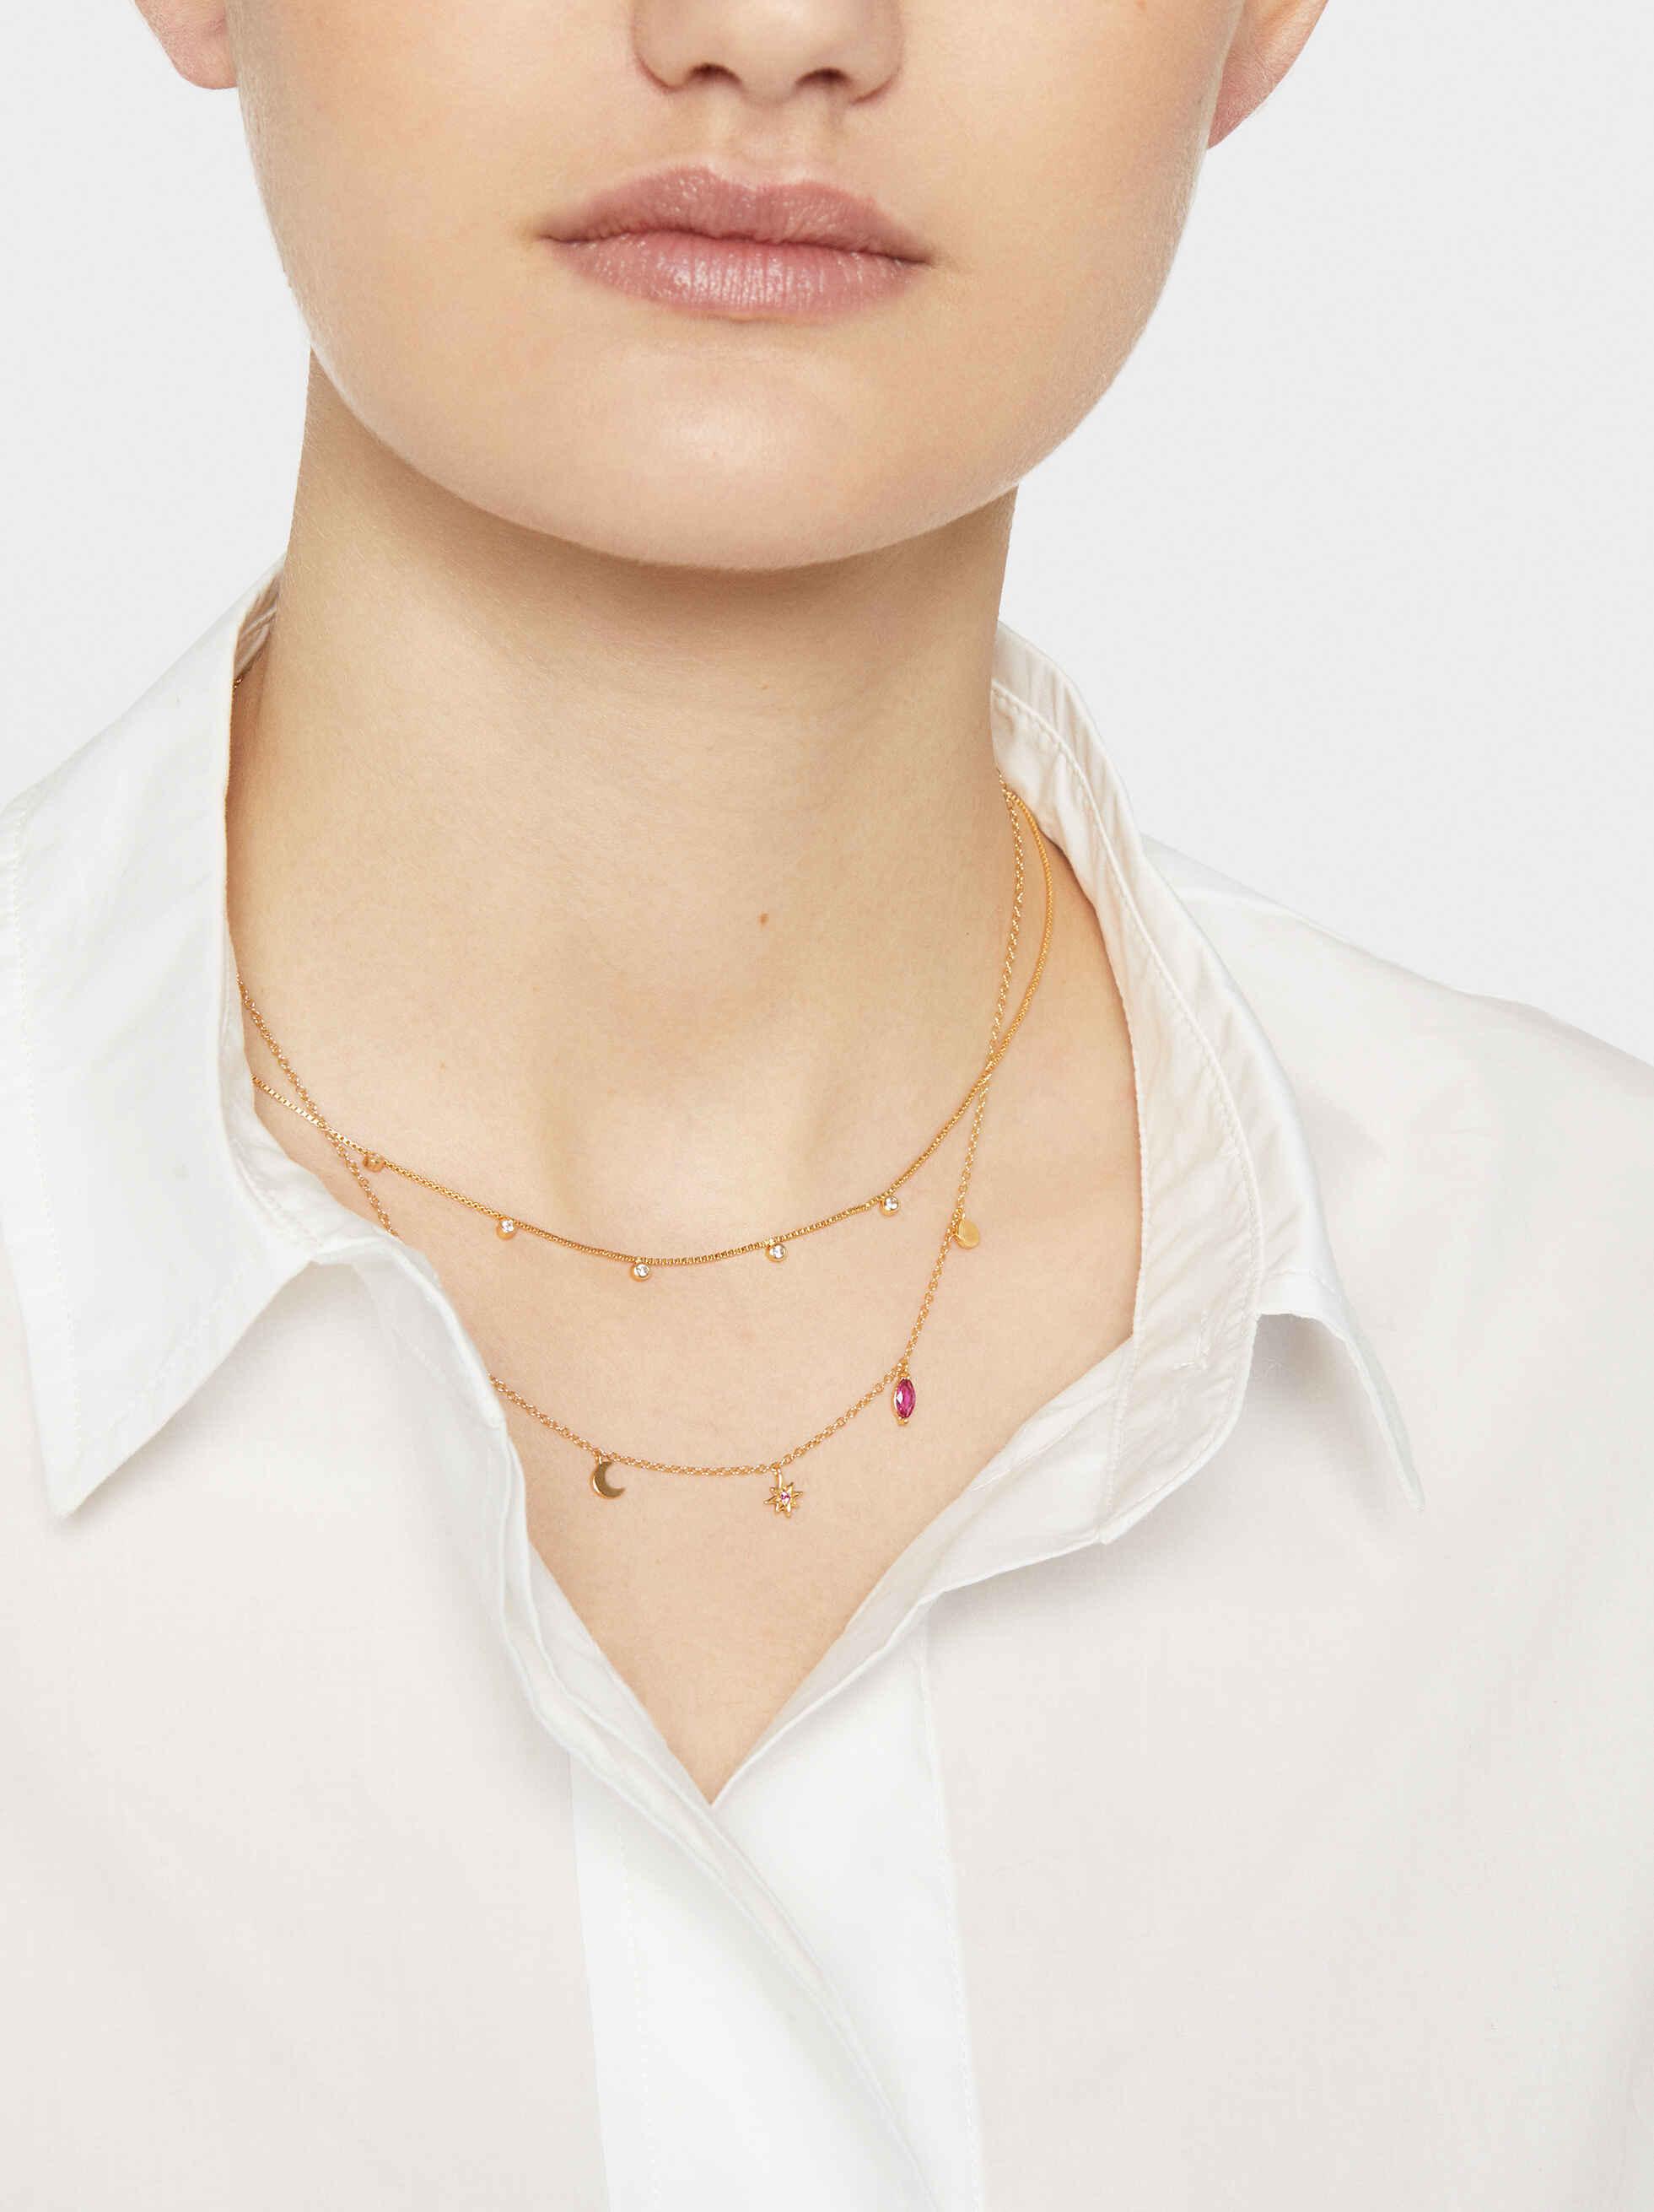 Short 925 Silver Necklace With Rhinestones, Golden, hi-res